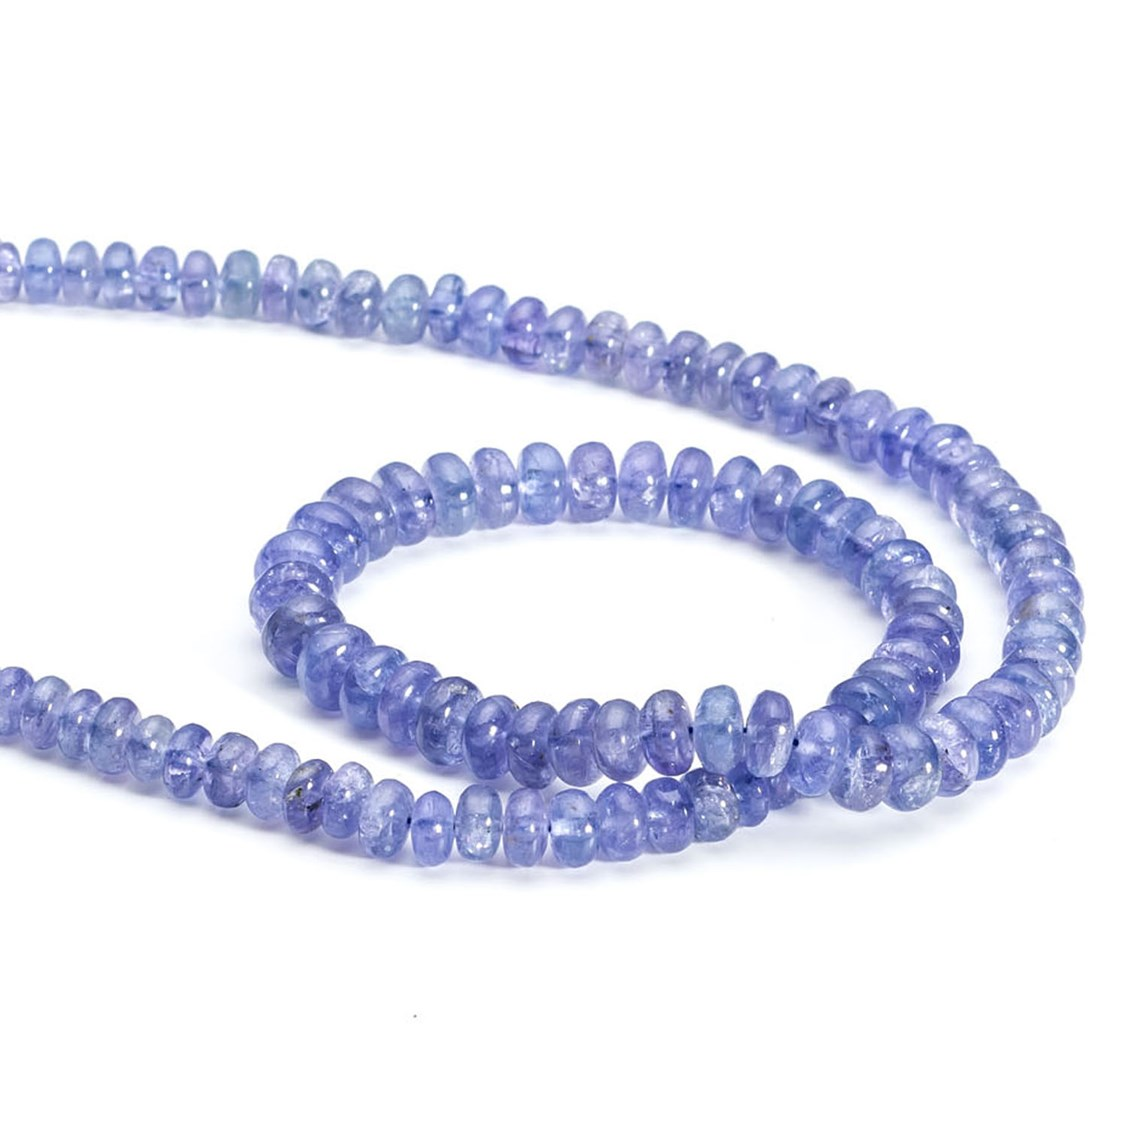 tanzanite beads from Kernowcraft